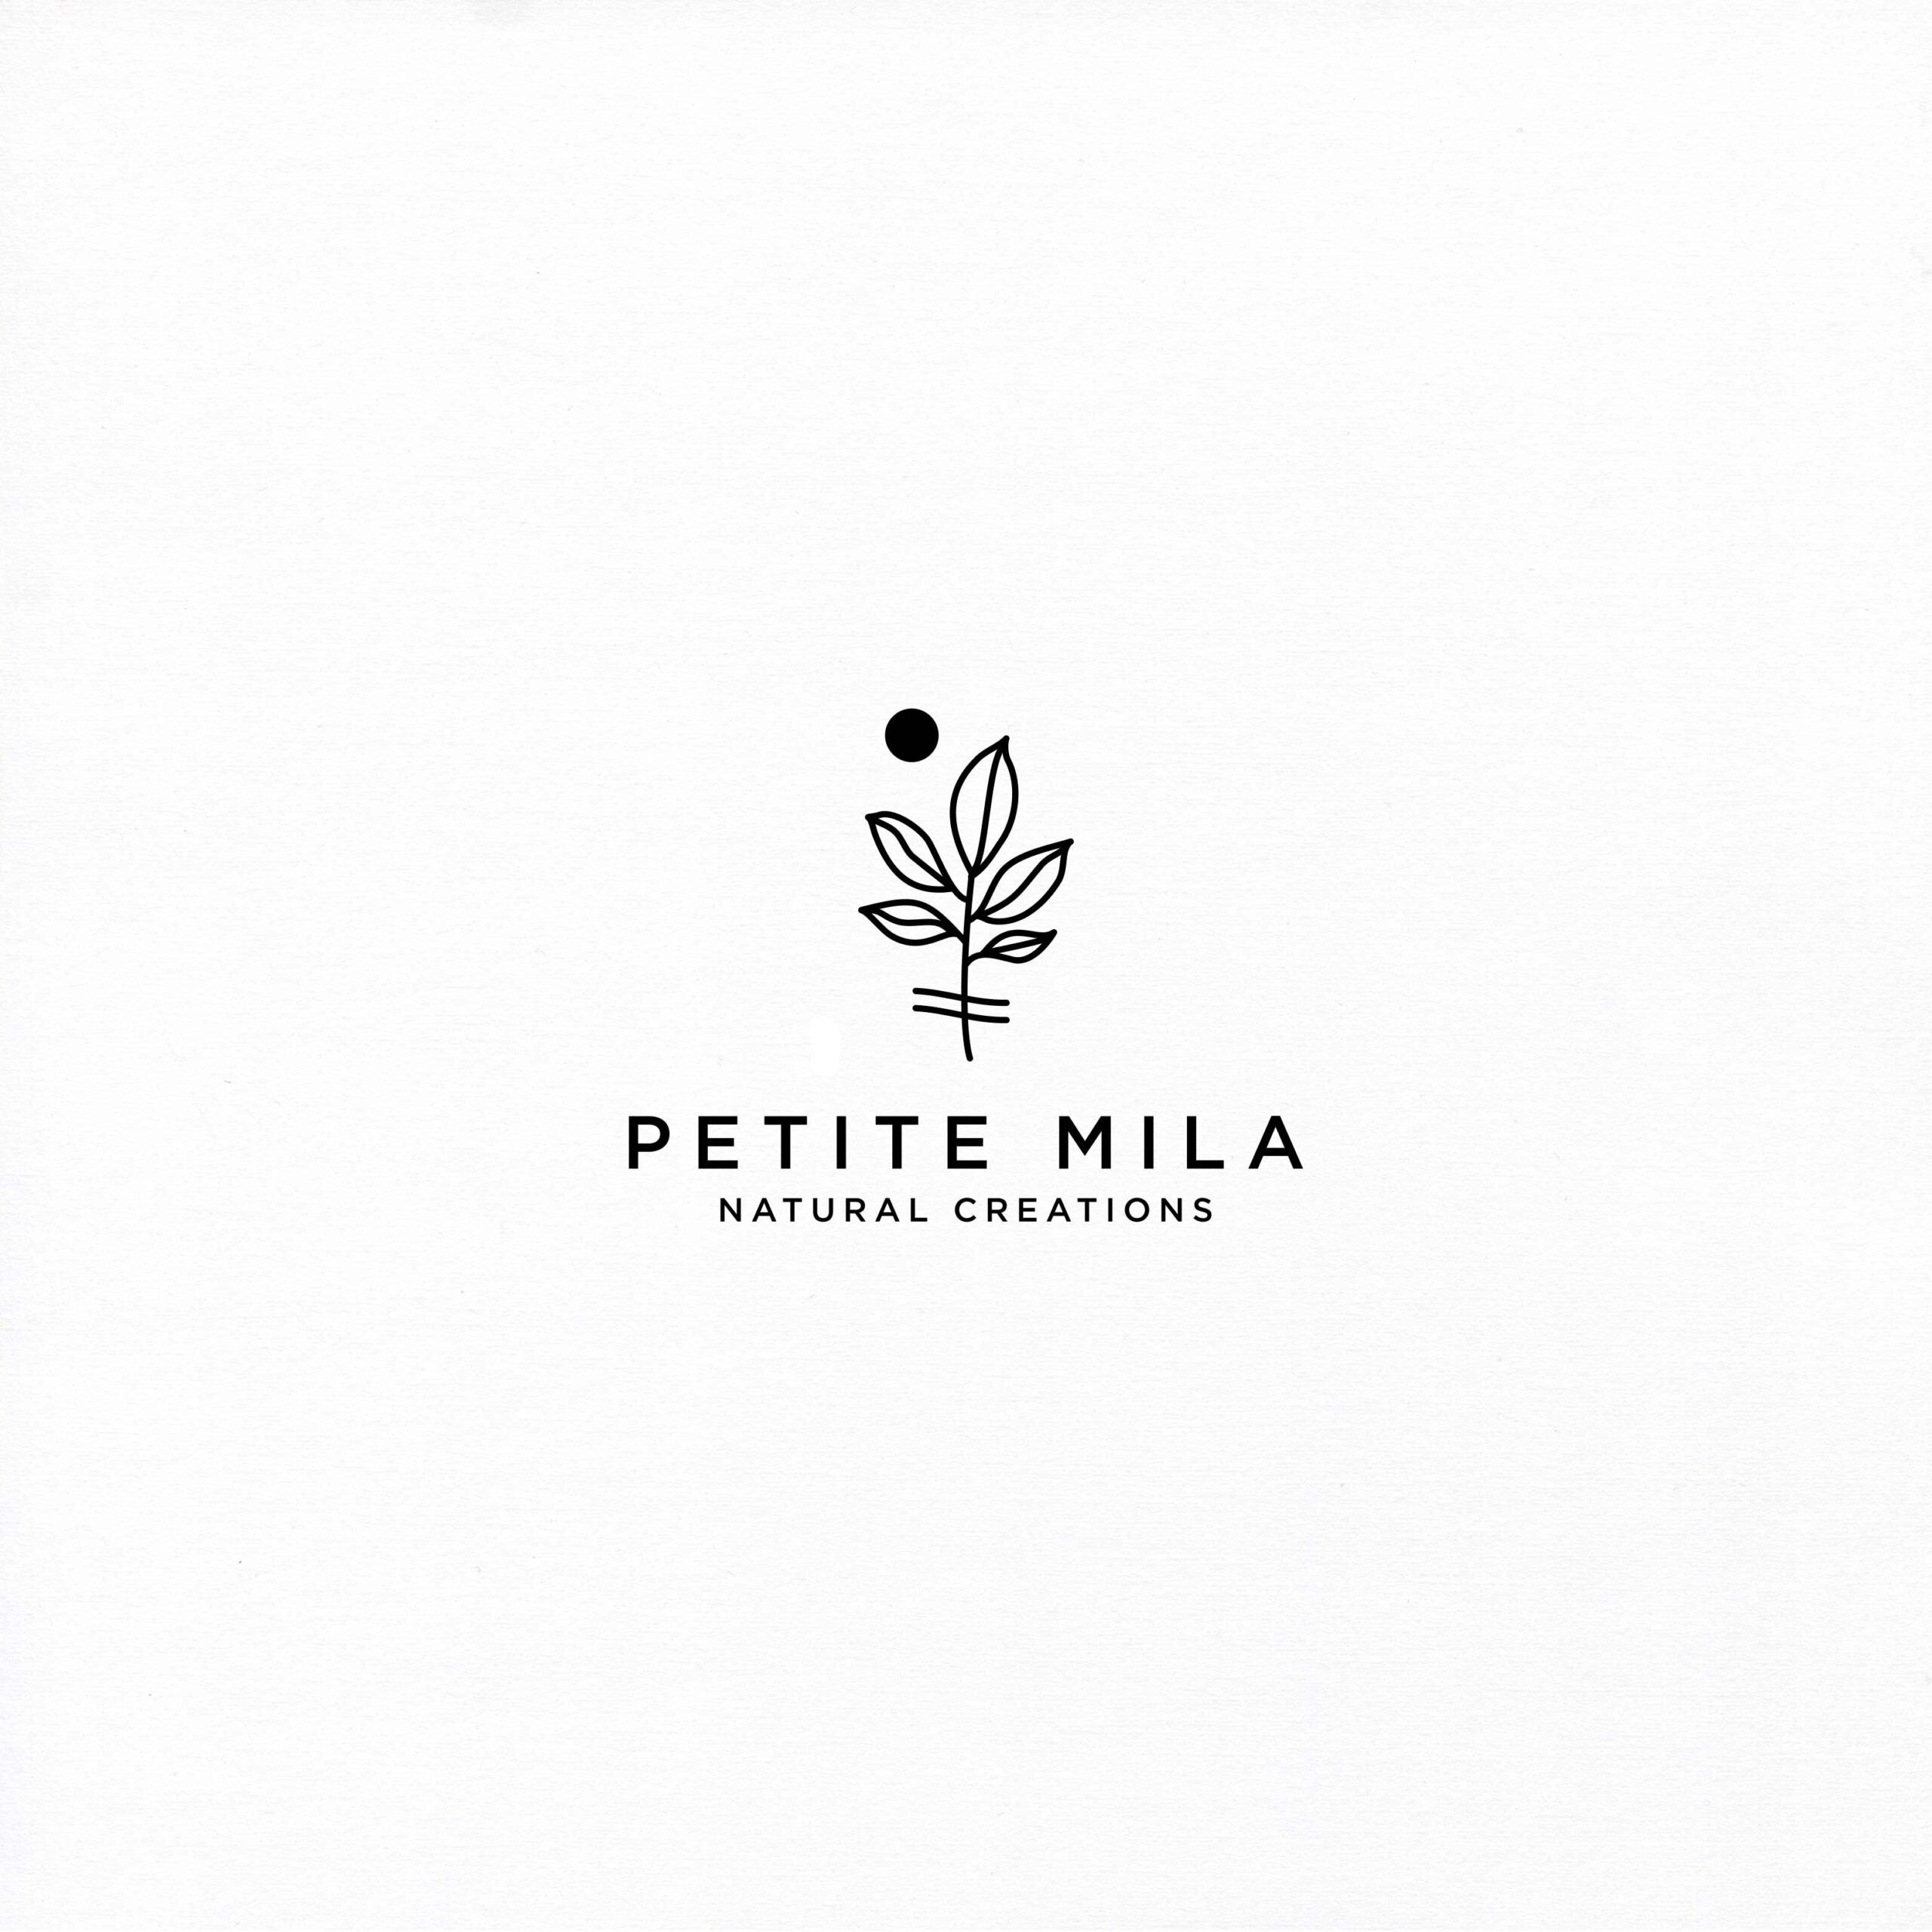 Petite-Mila-Portfolio-1